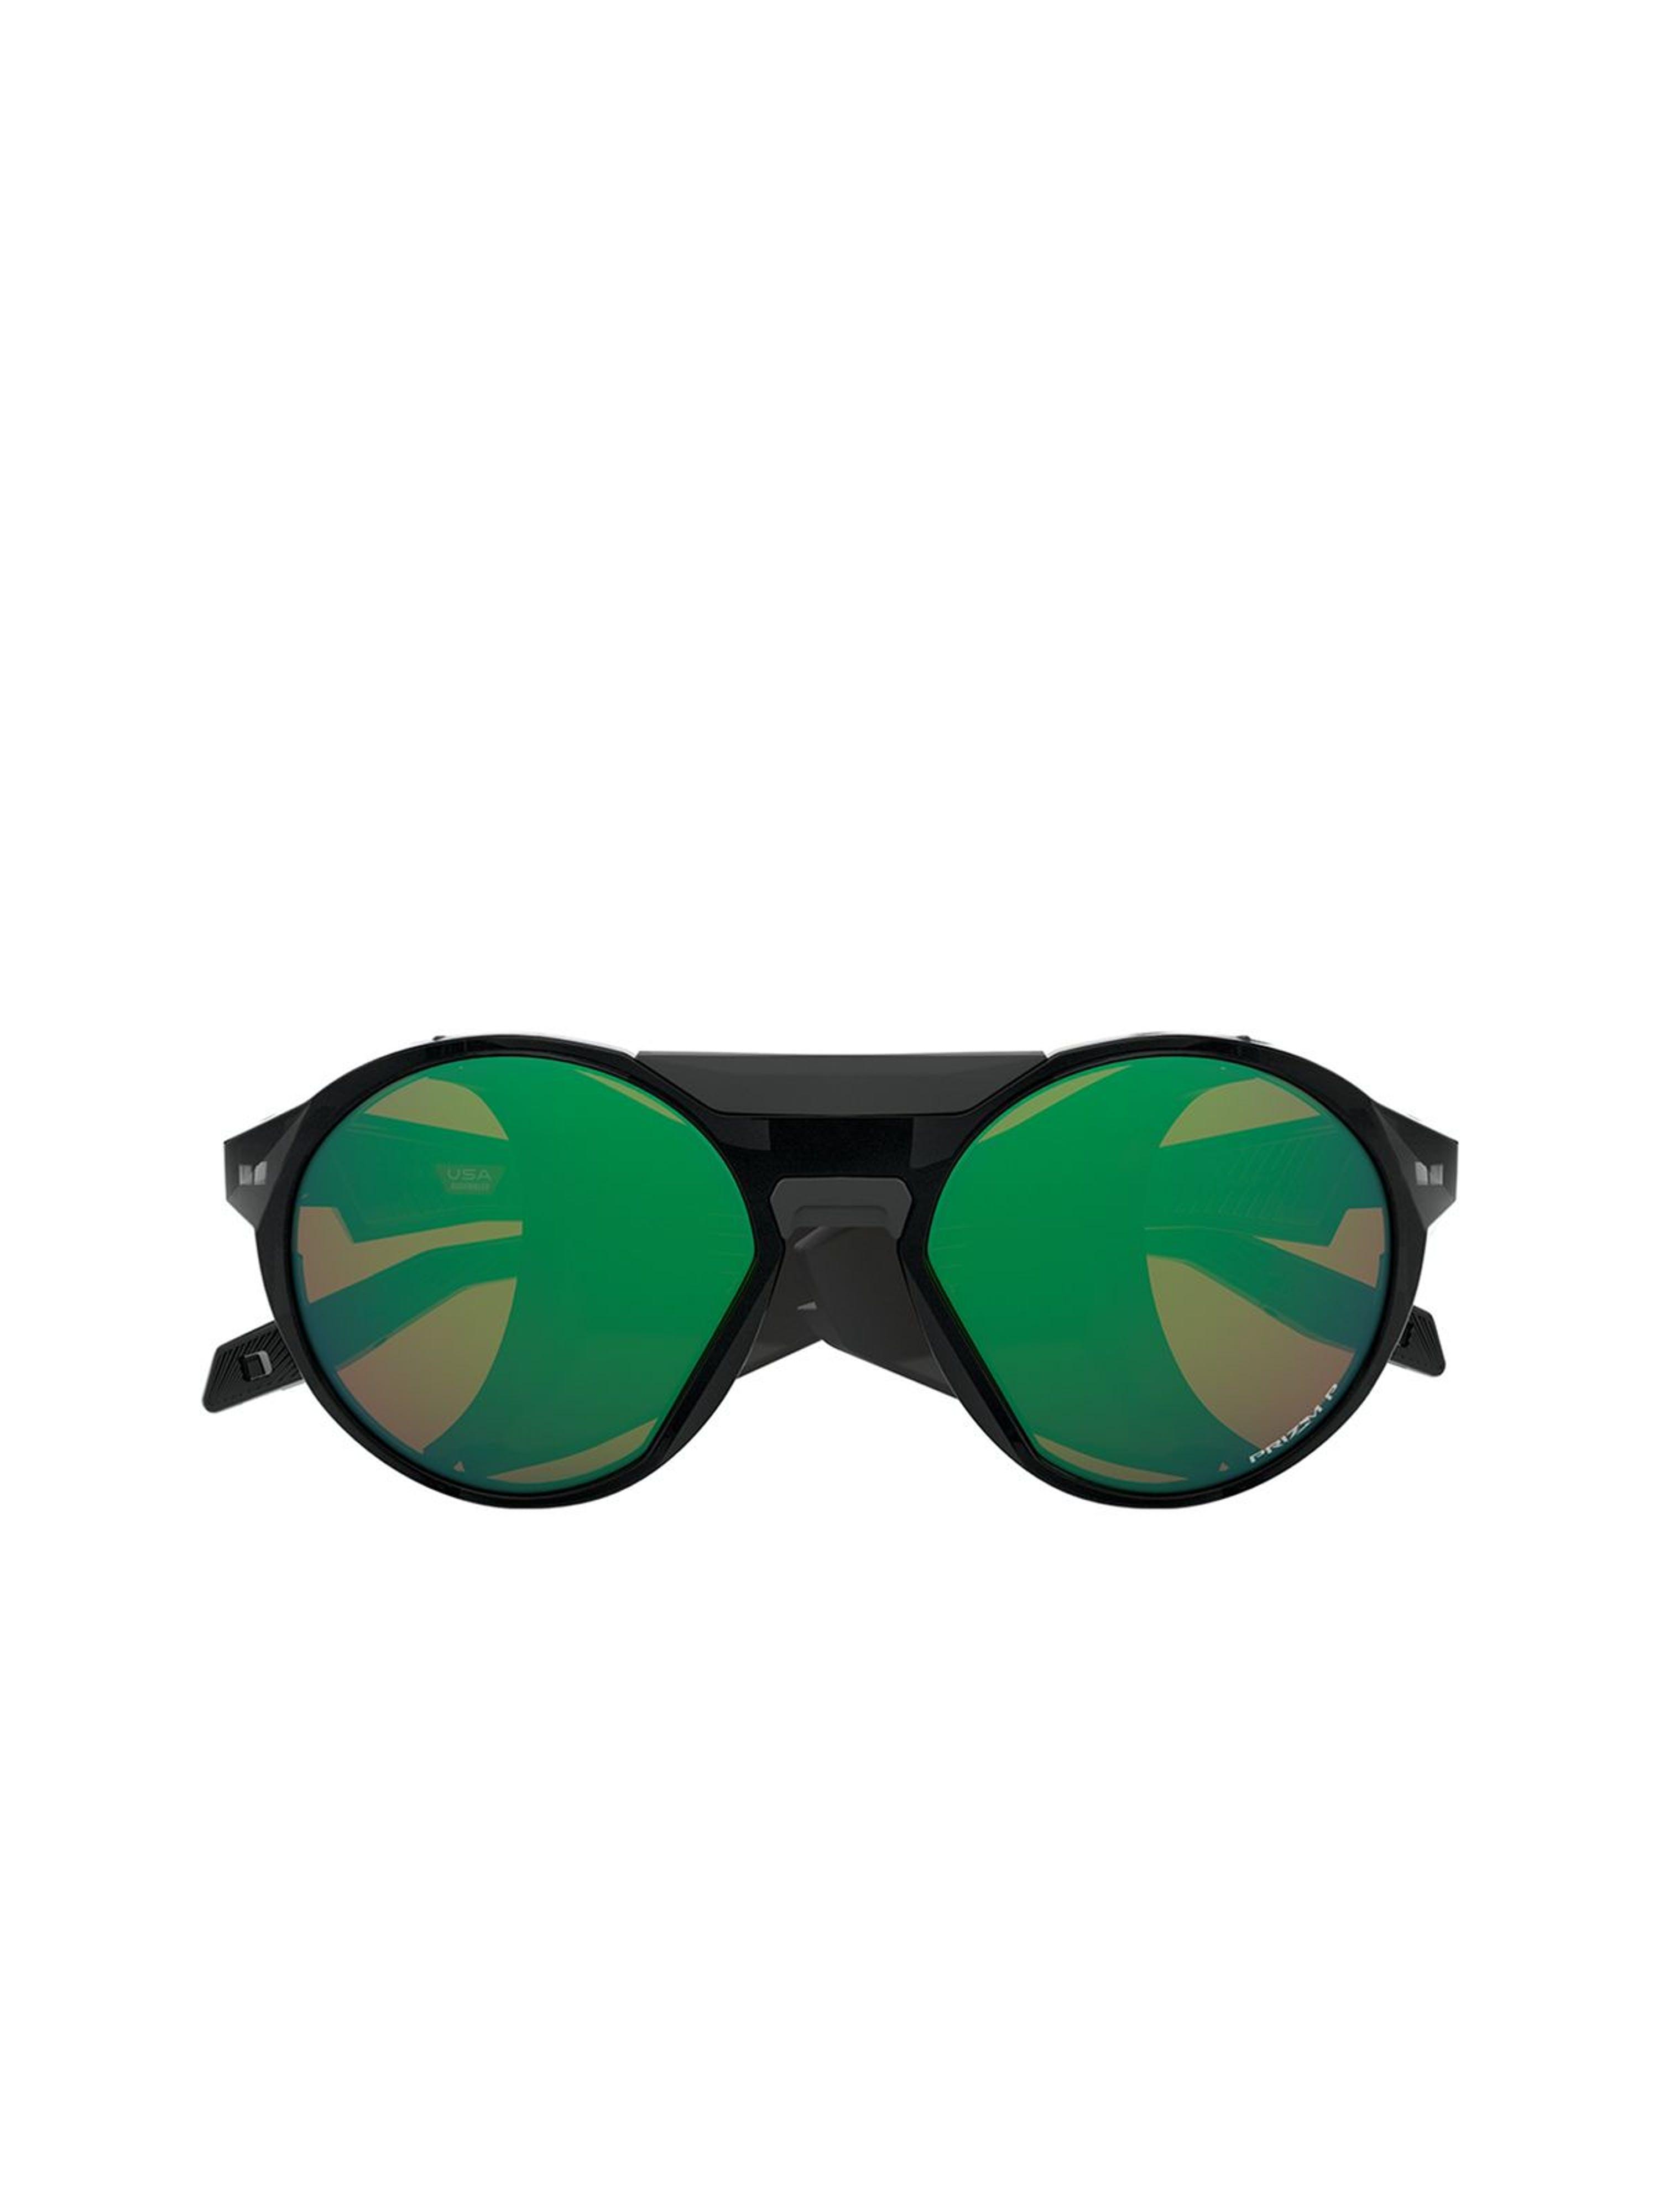 Hatchet Outdoor Supply Co. Brooklyn Clifden Sunglasses  - Black